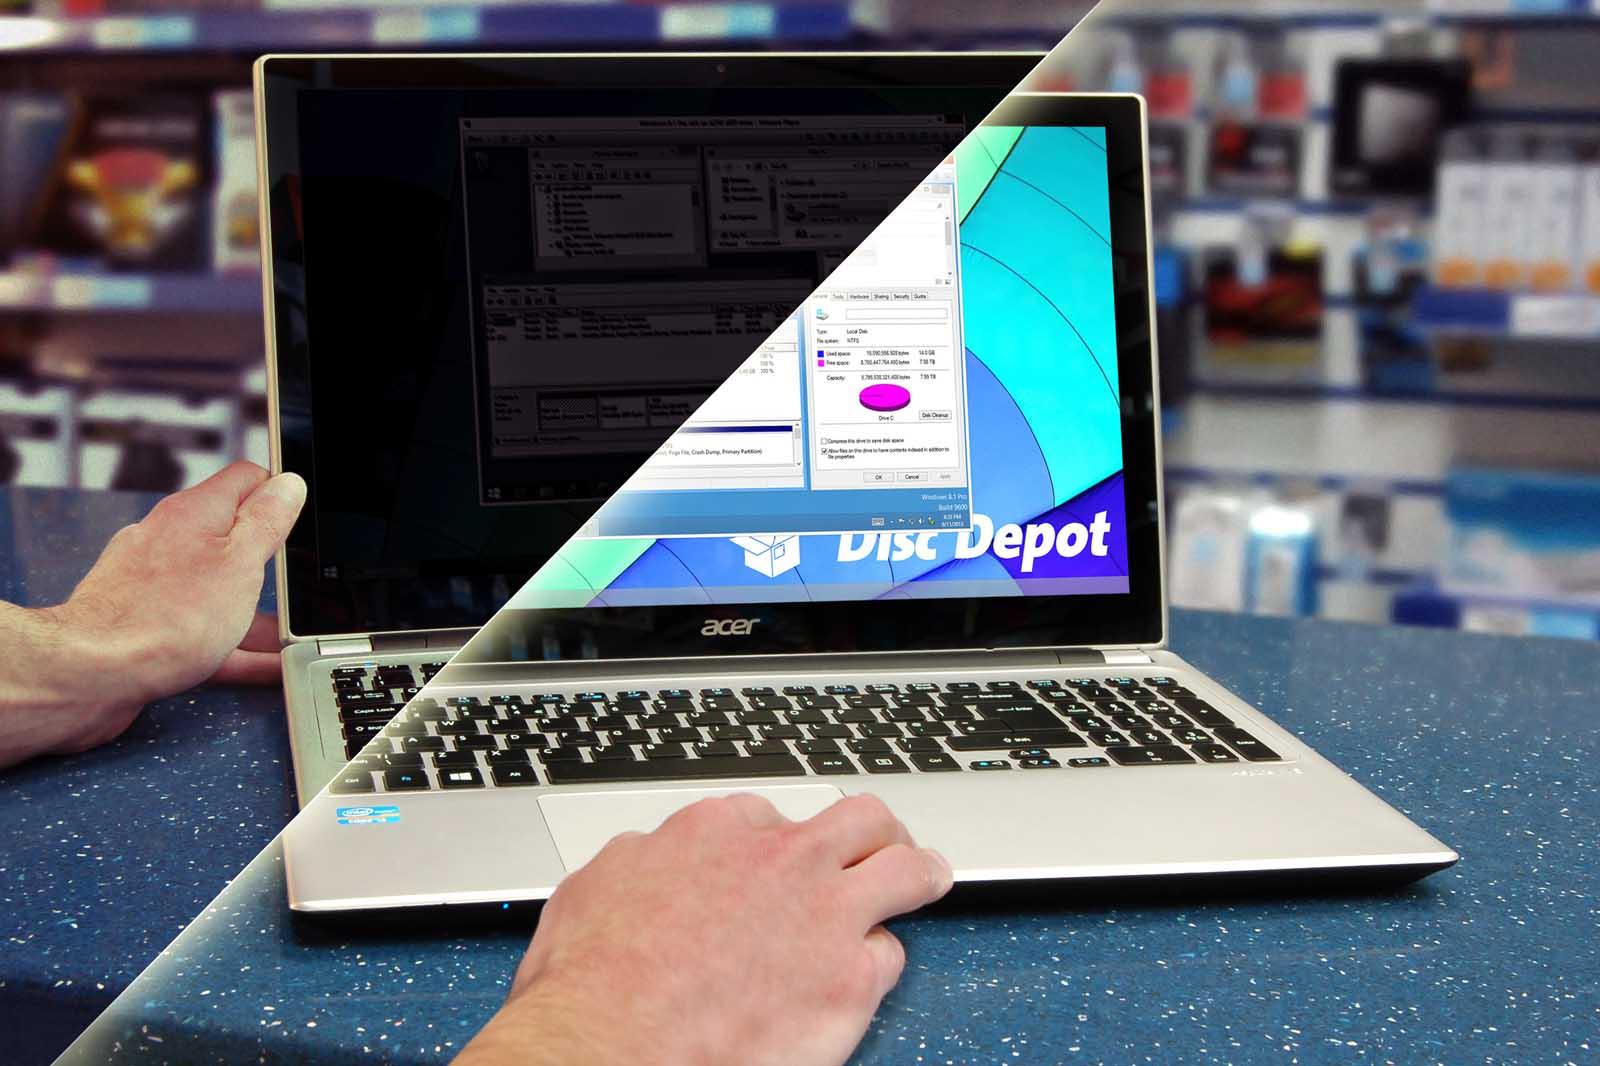 Laptop Inverter and Backlight Repair for Dim Screens | Disc